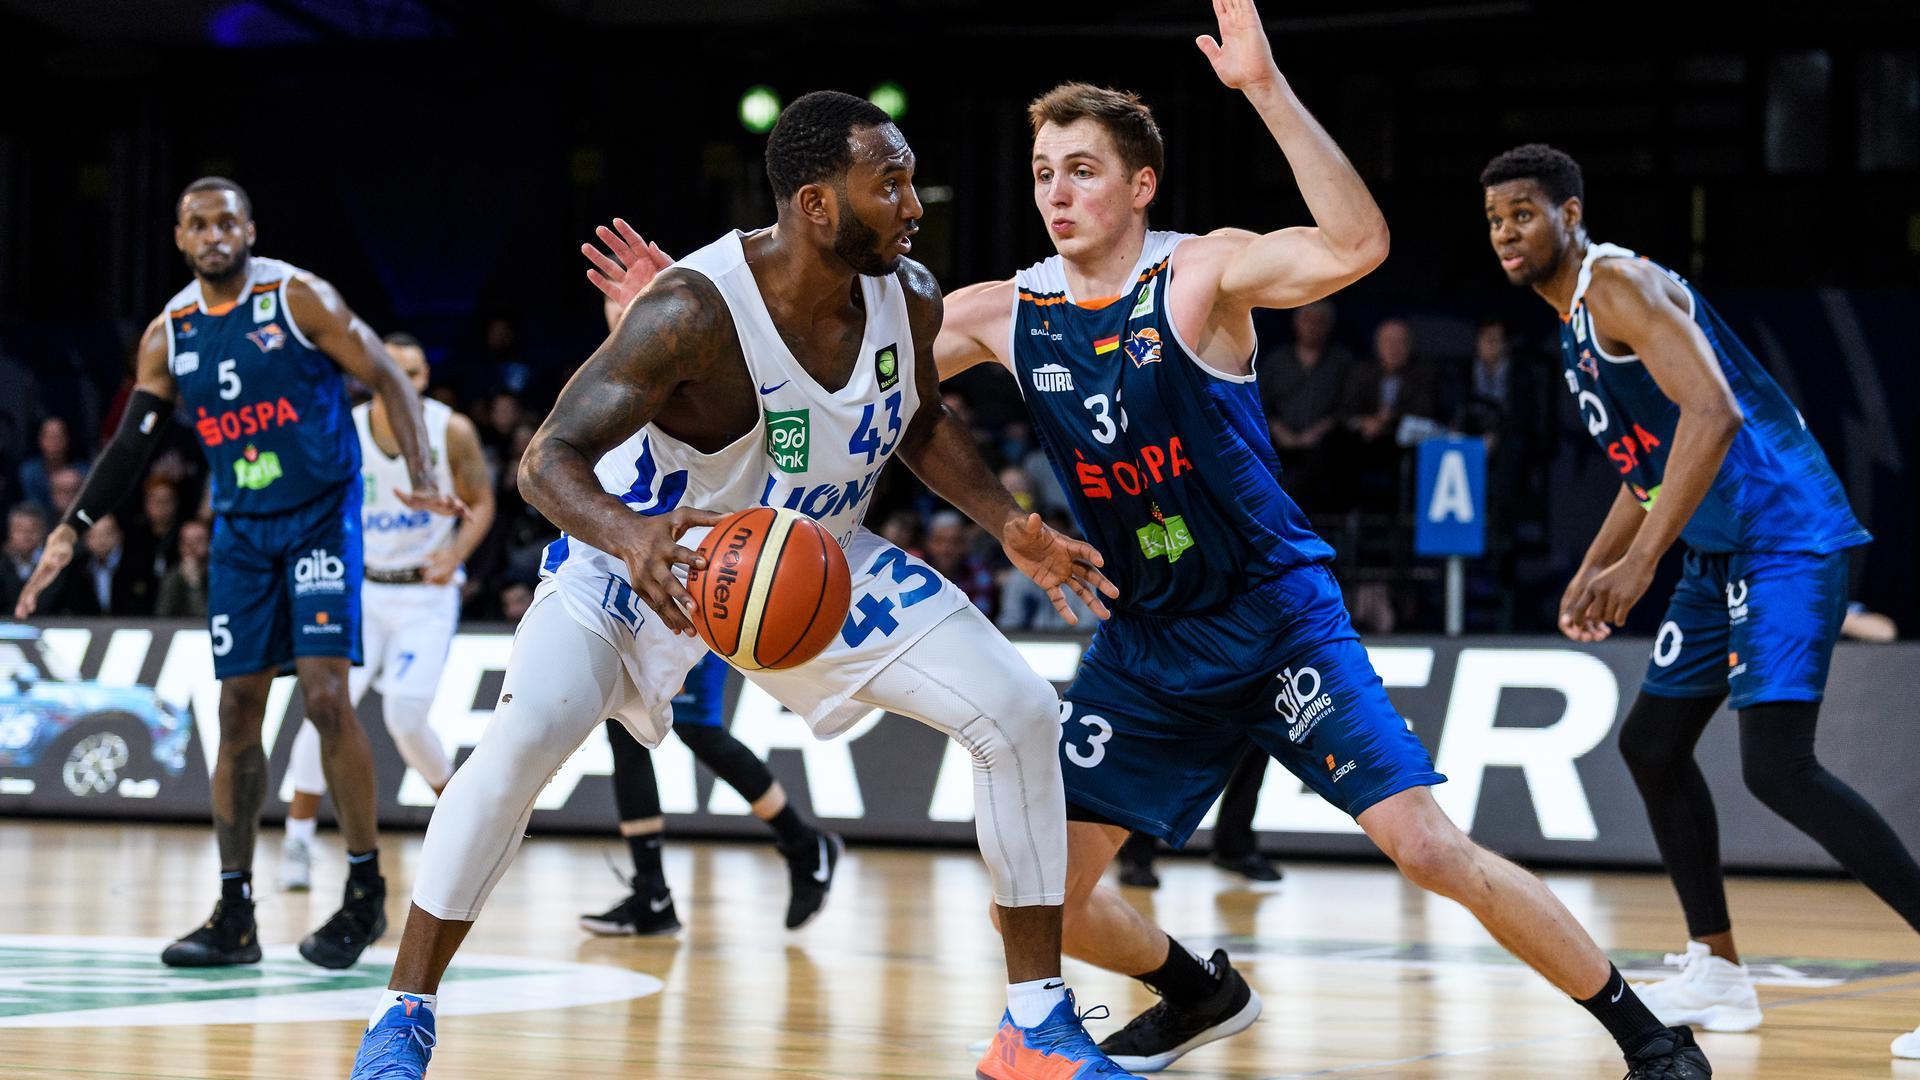 Cyrus Lamont Tate (Lions) im Zweikampf mit Tom Alte (Rostock).  GES/ Basketball/ ProA: PSK Lions - Roctock Seawolves, 01.03.2019 --